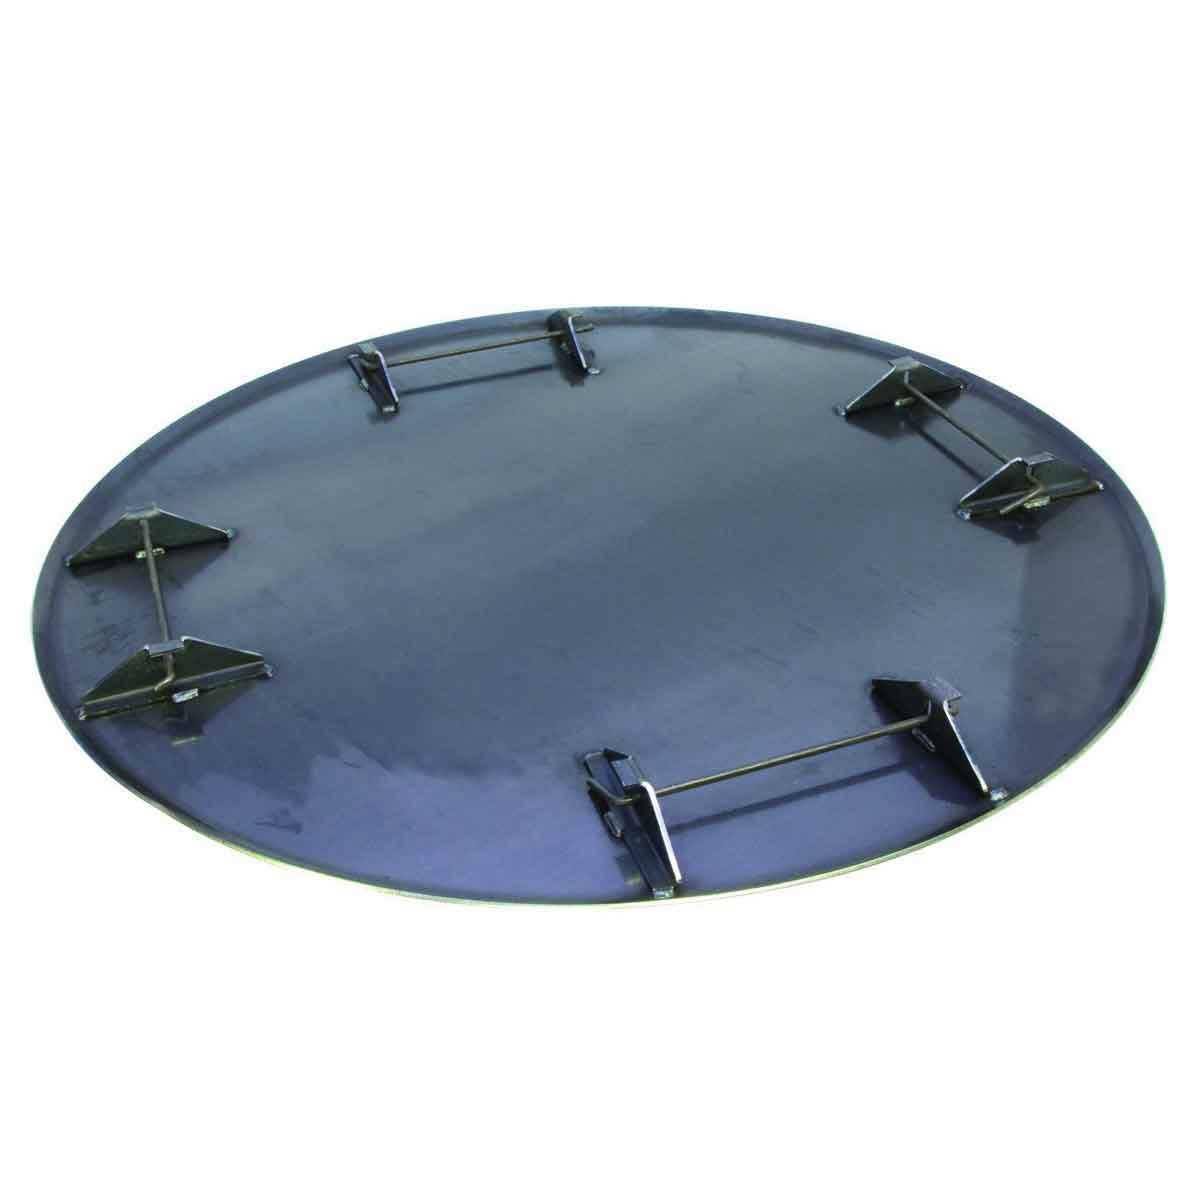 Bartell Float Pans